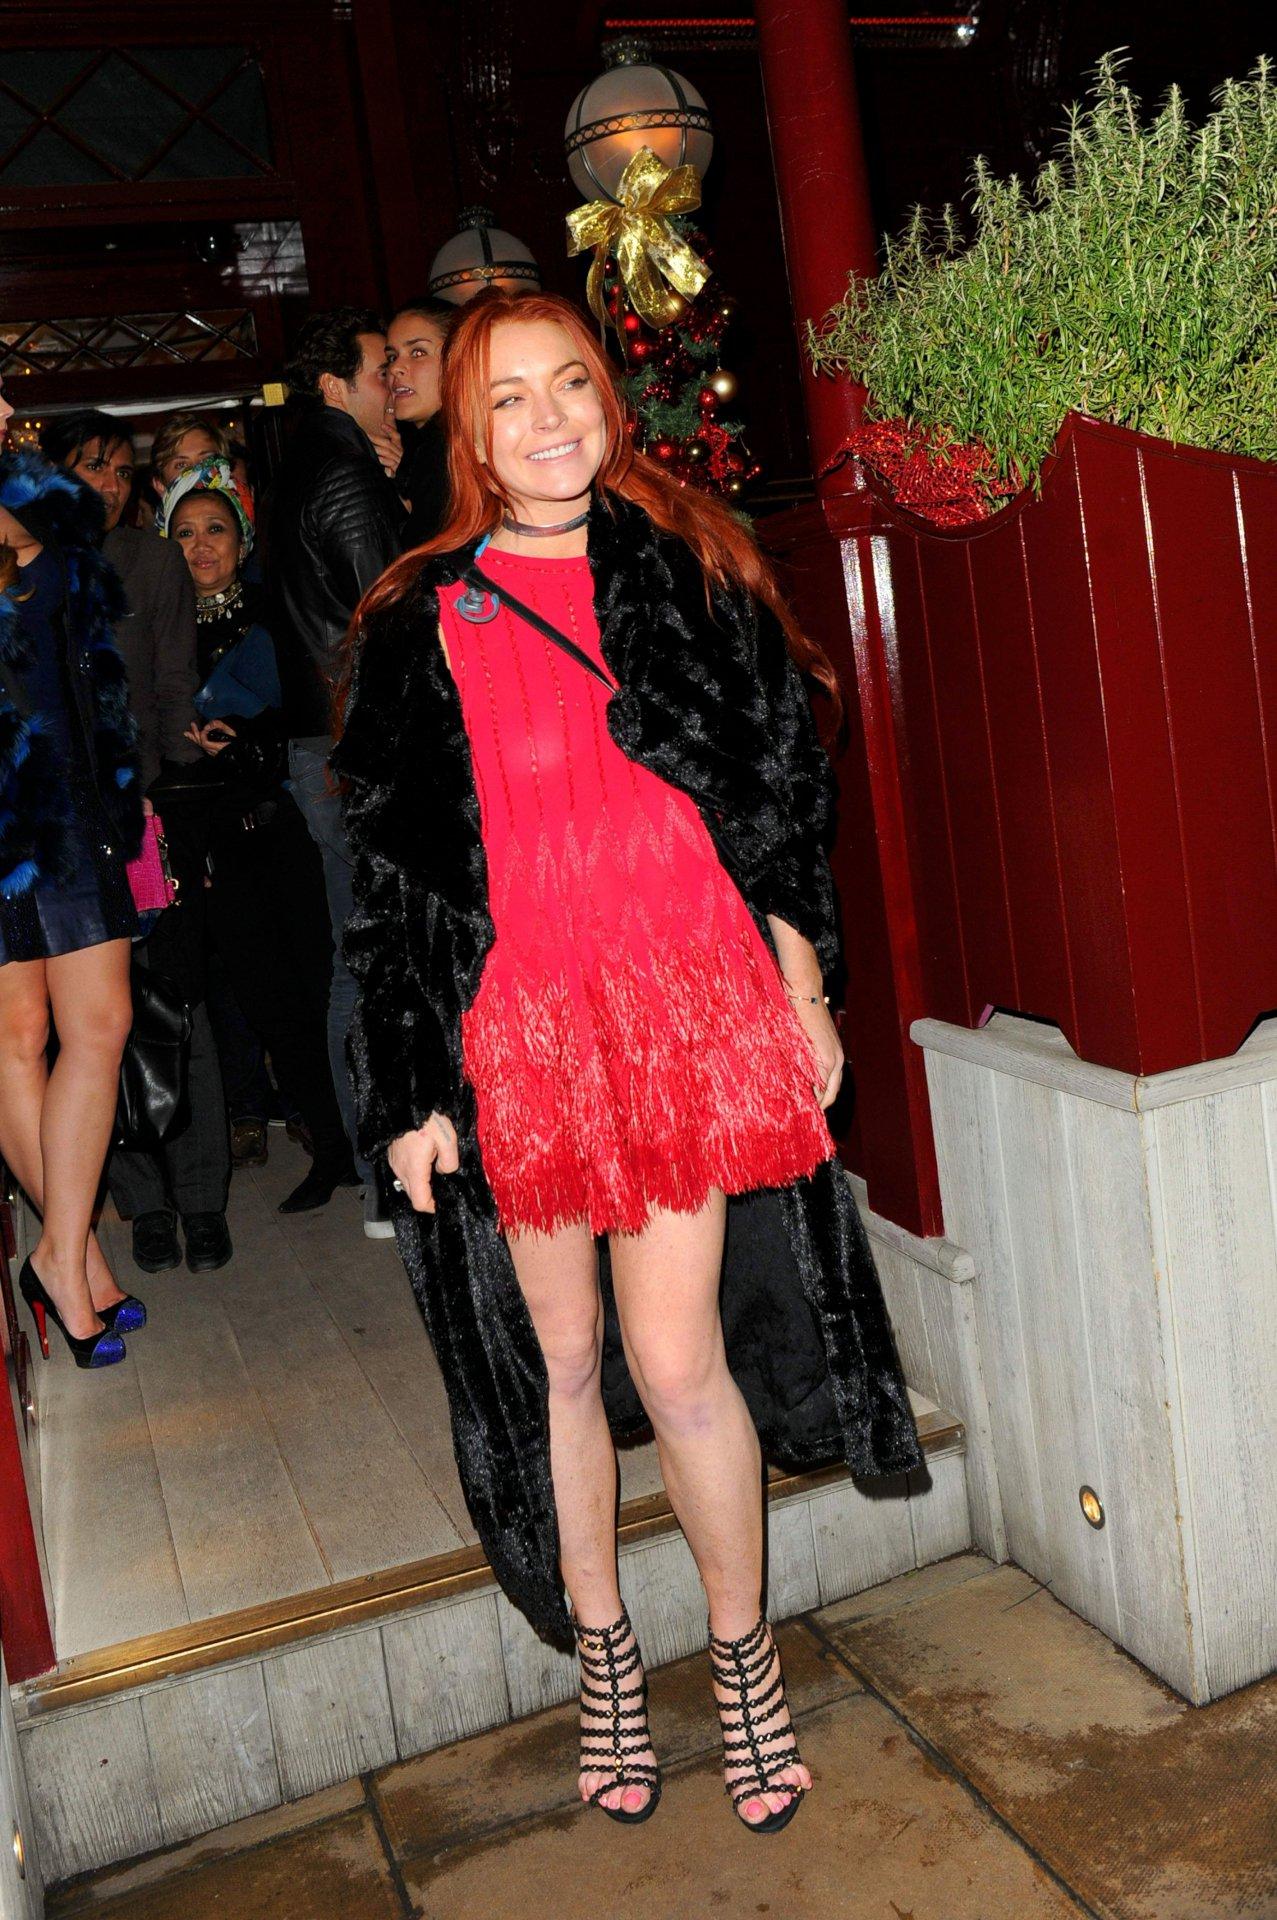 Playmate Jayde Nicole -- Lindsay Lohan Better Go Spread